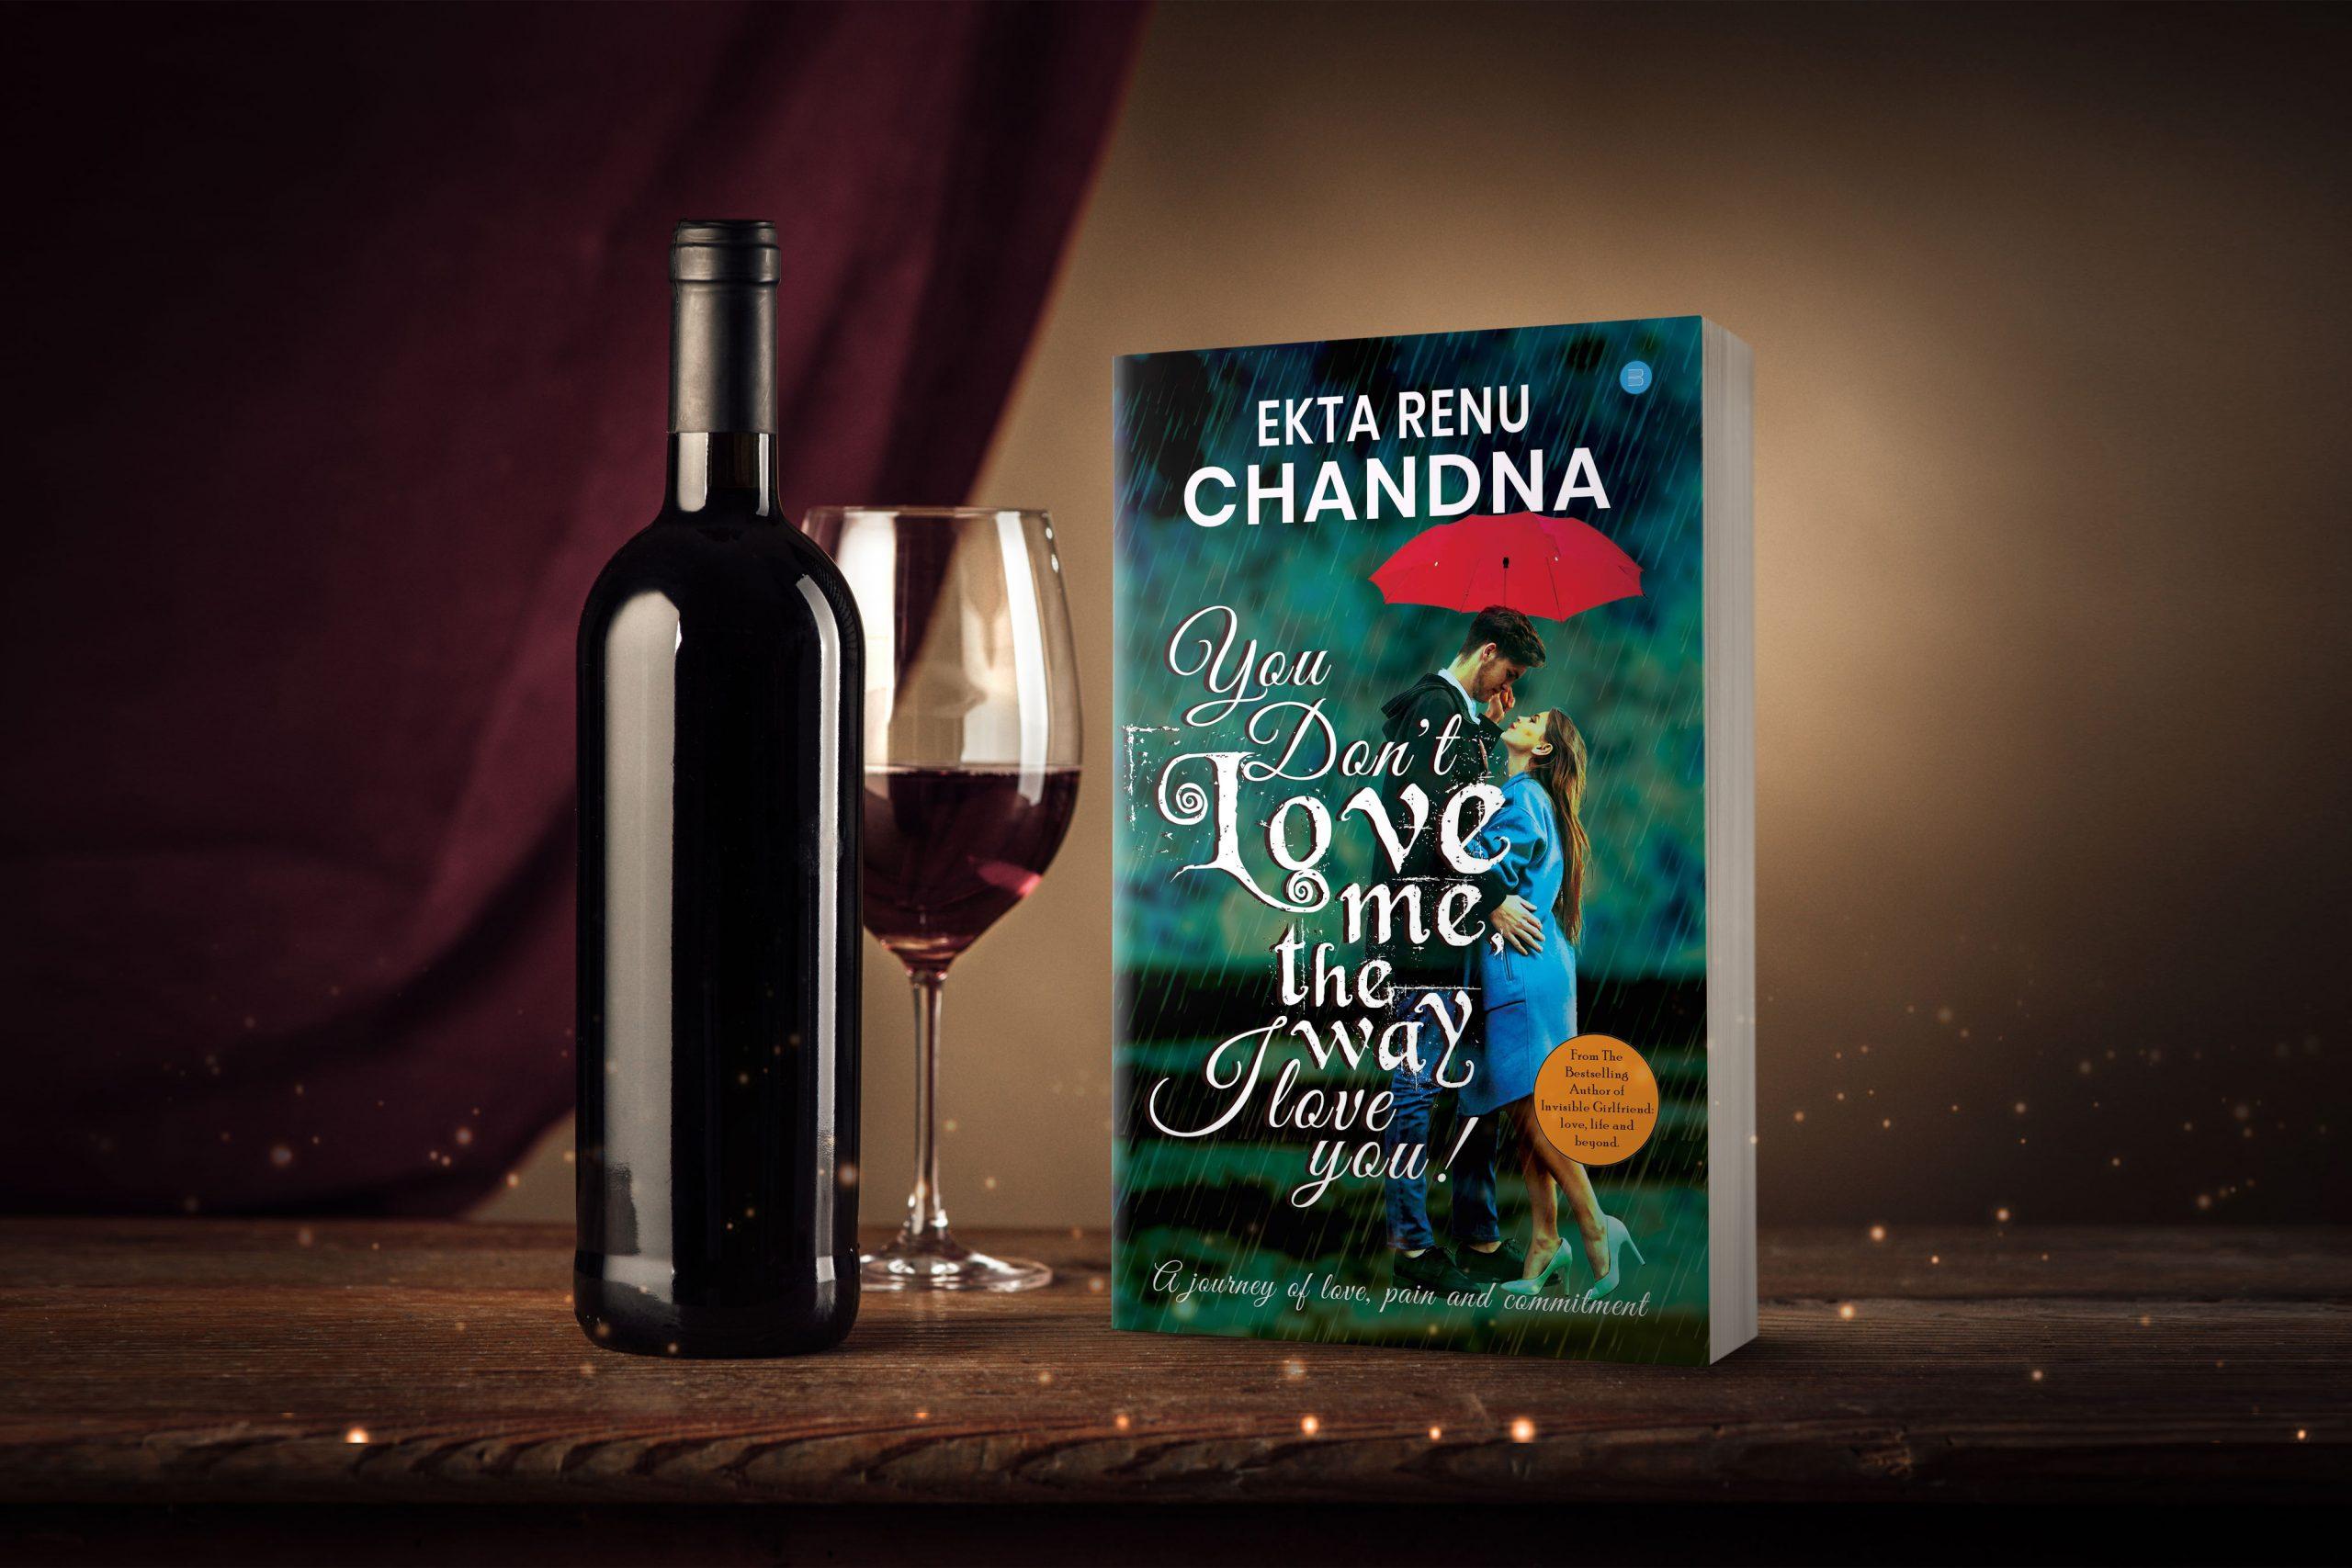 You don't love me the way I Love you! By Ekta Chandana